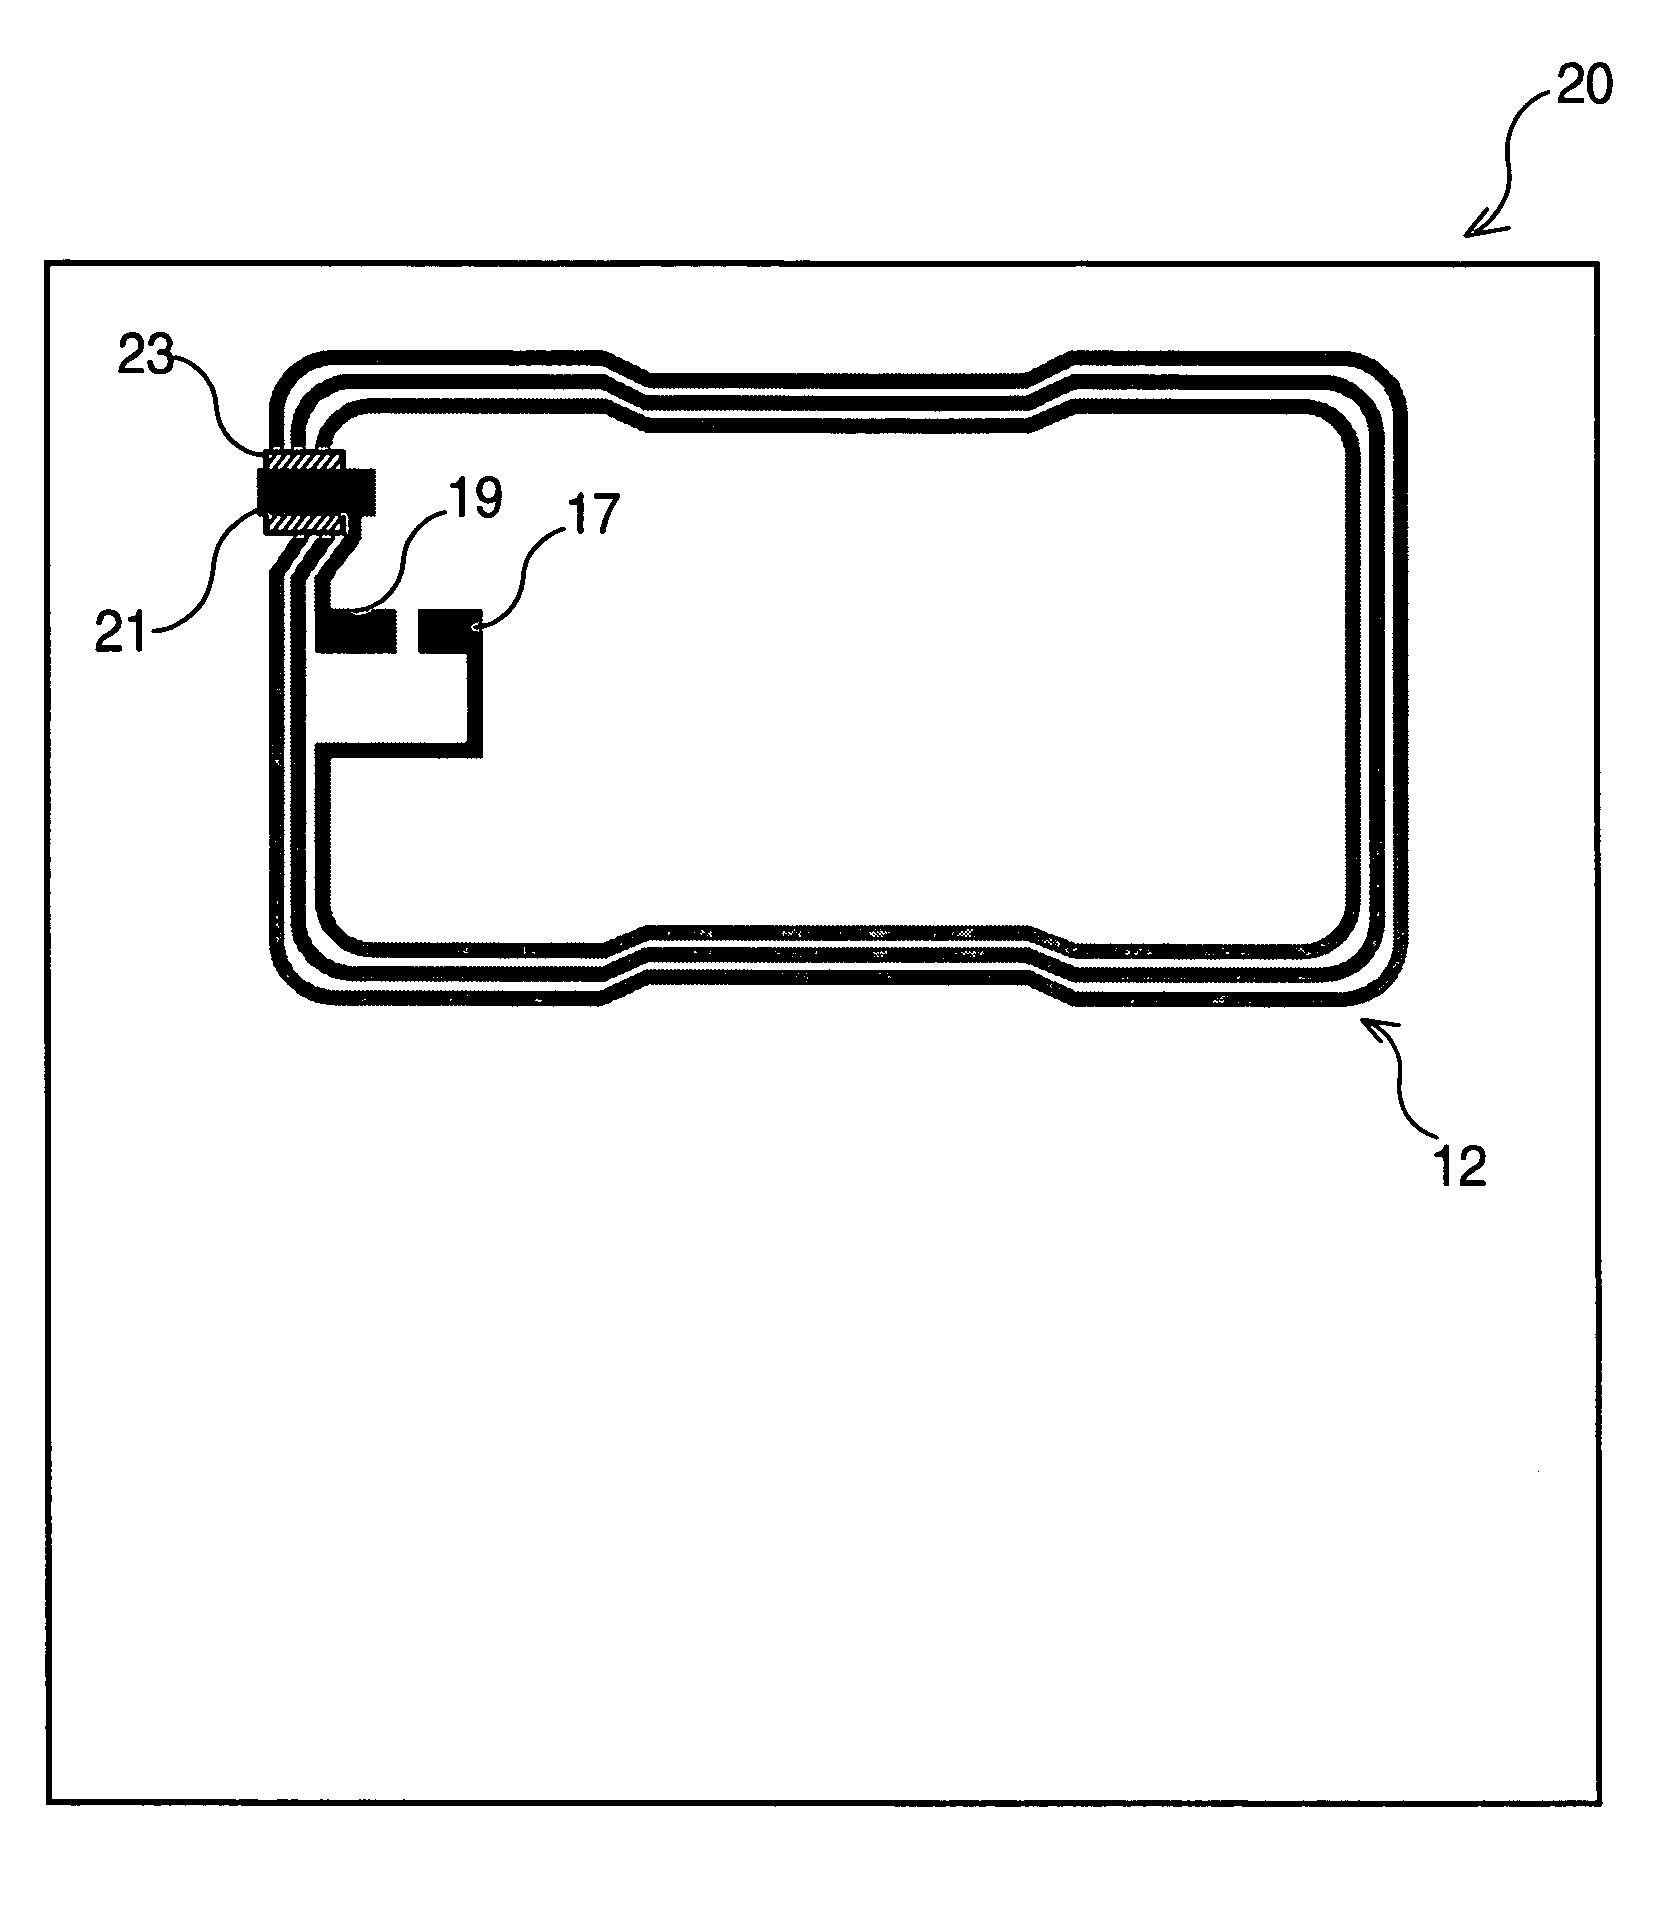 radio frequency identification device pdf